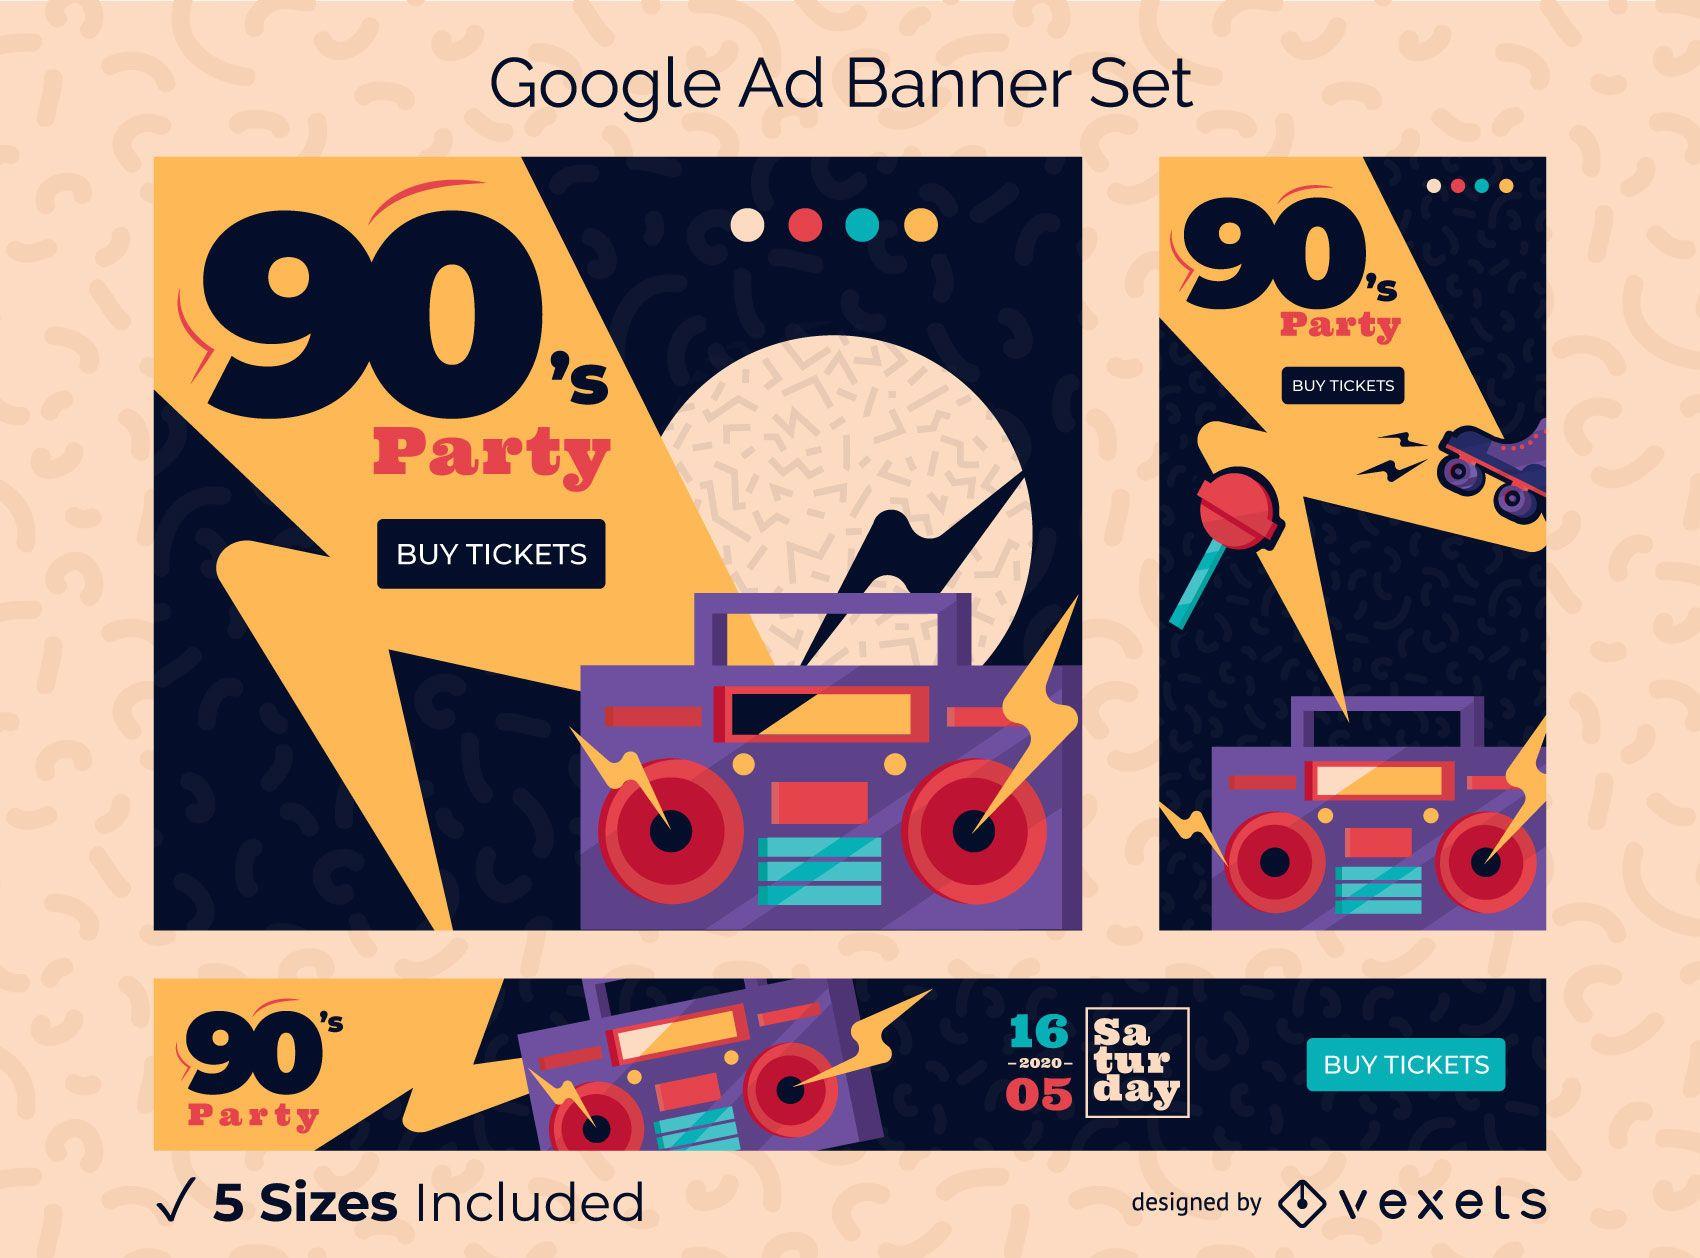 90s Party Google Ads Banner Design Pack